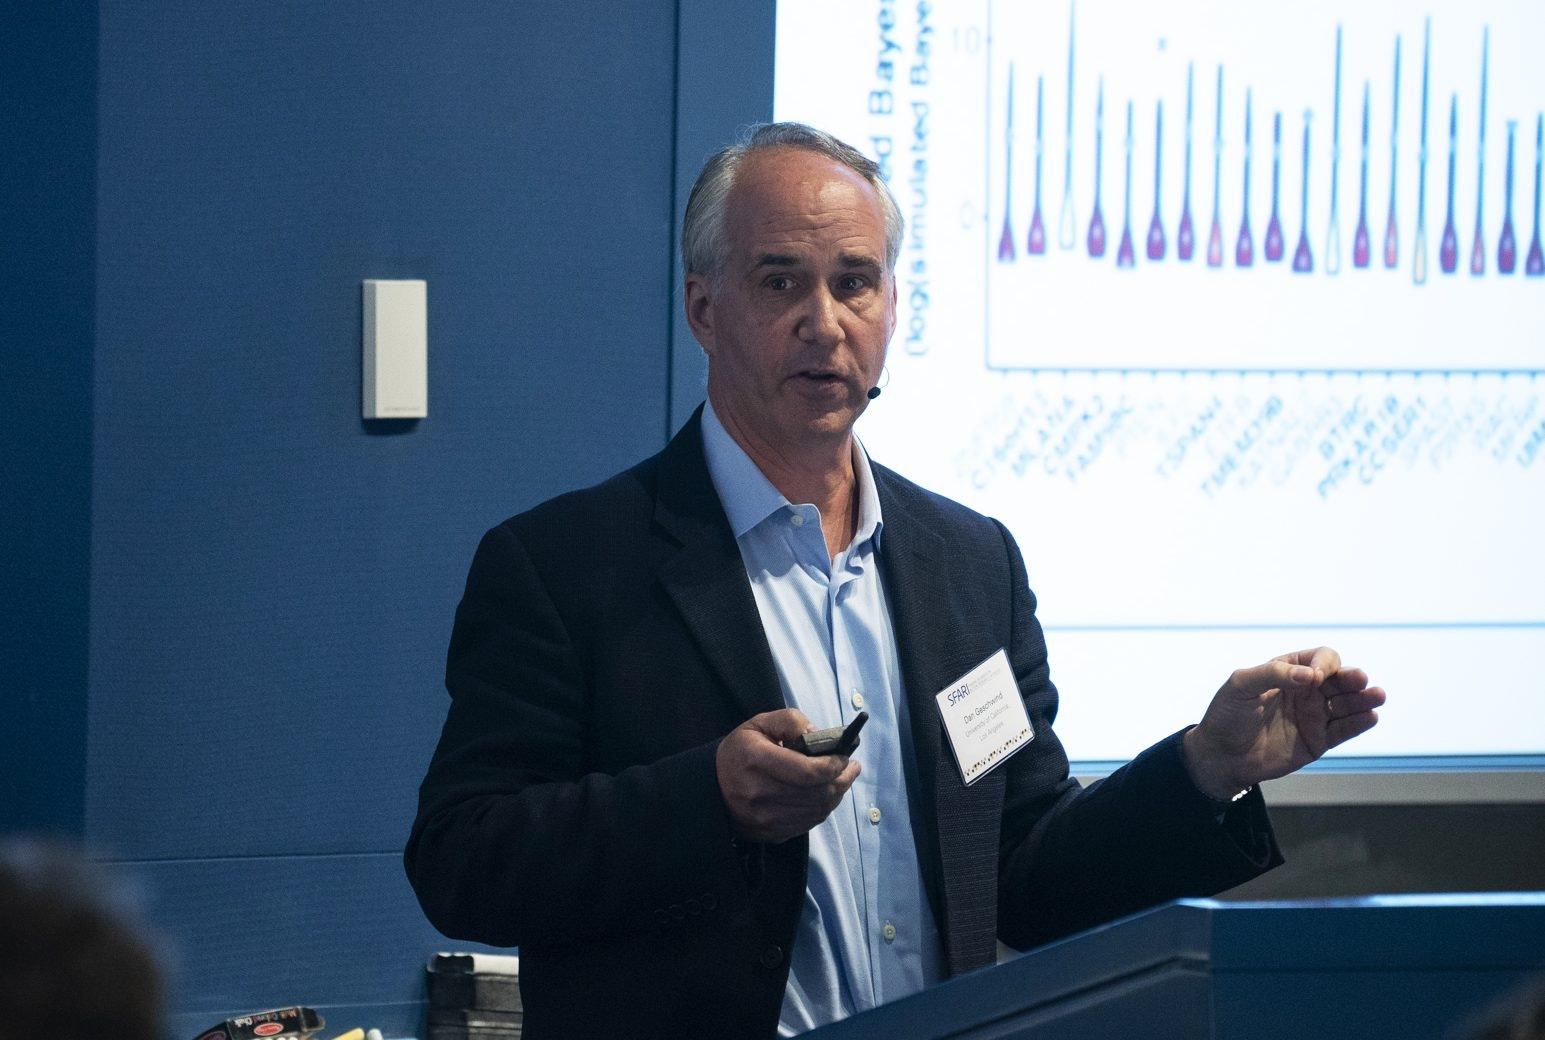 Image of Daniel Geschwind giving a presentation.